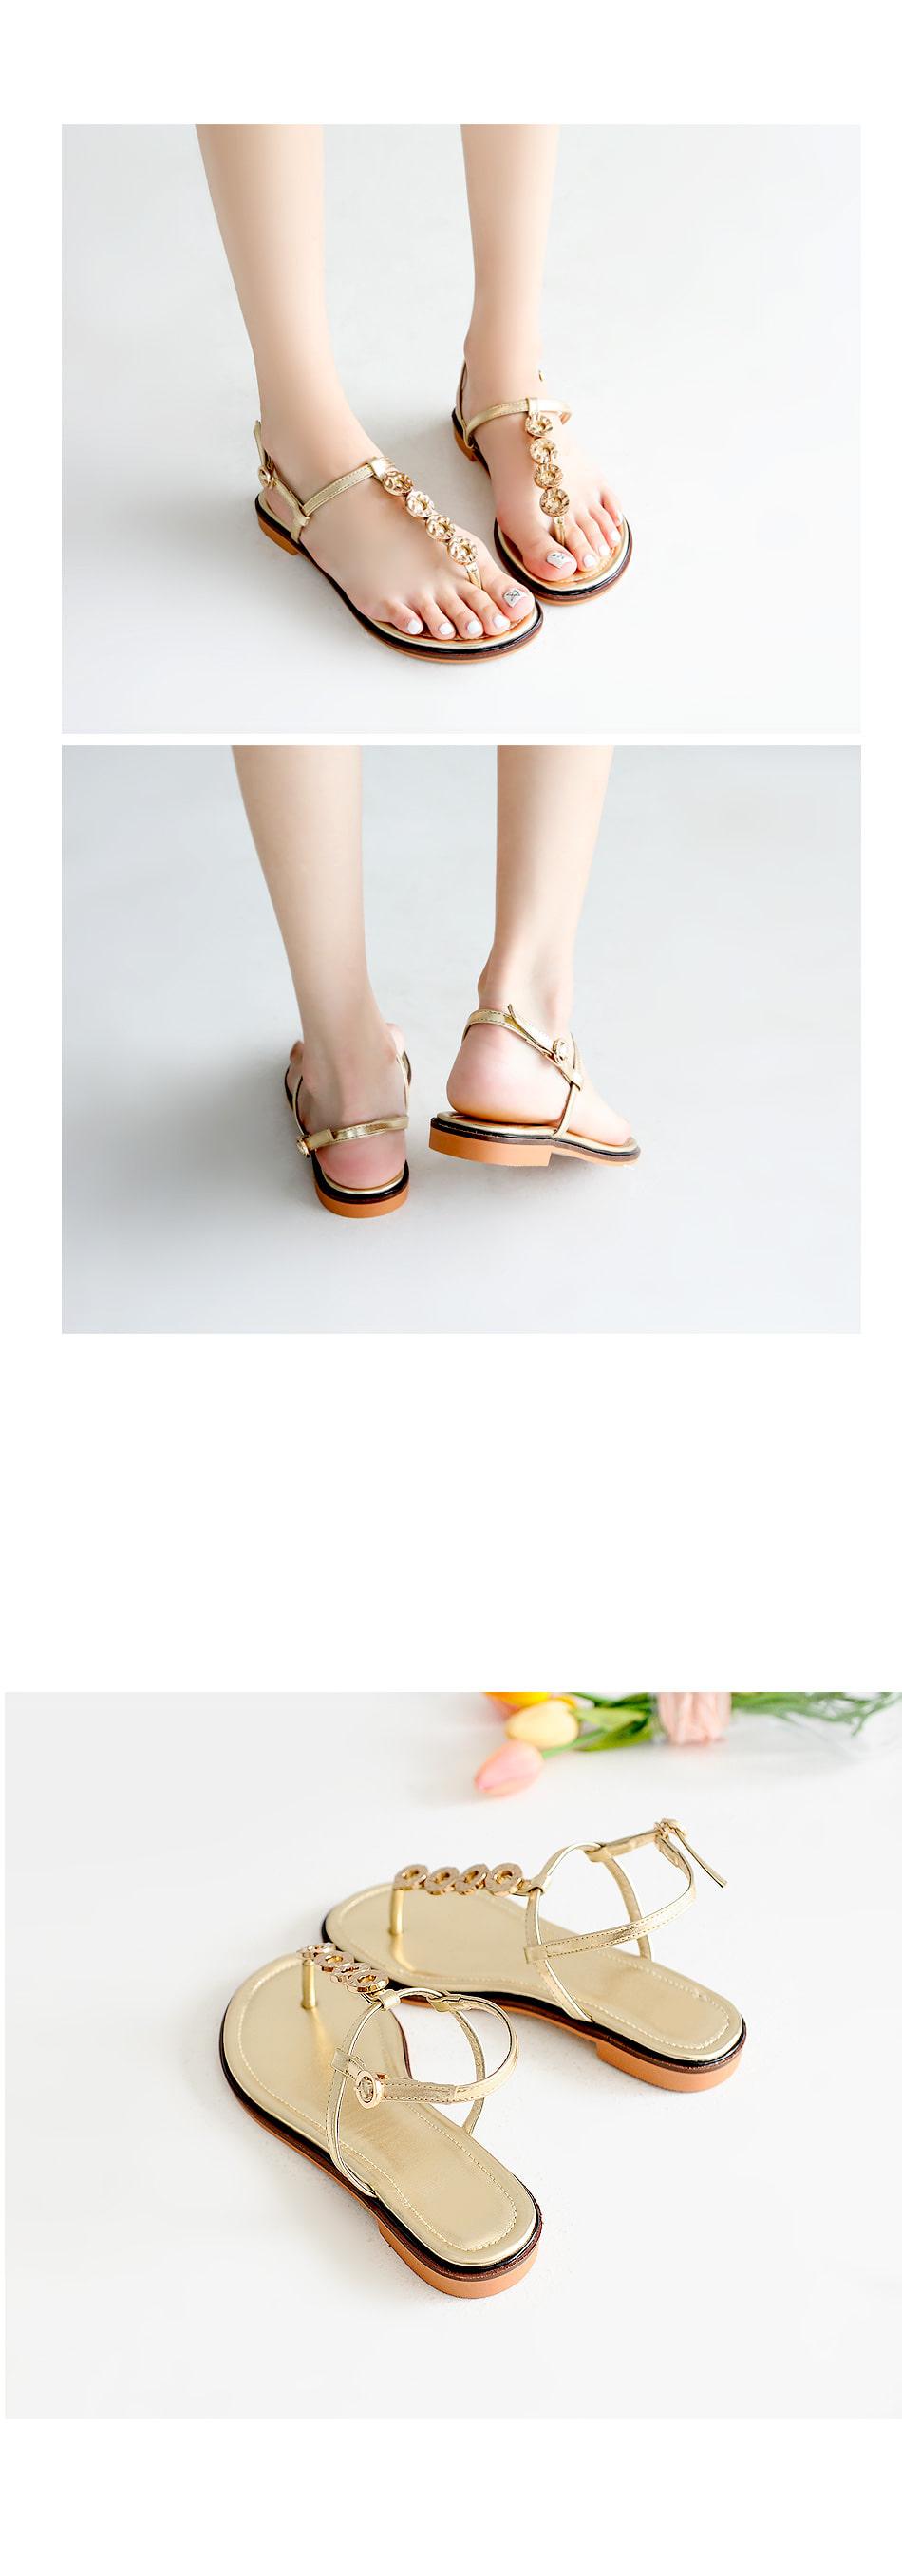 Webby Aircrew Slingback Sandals 1cm